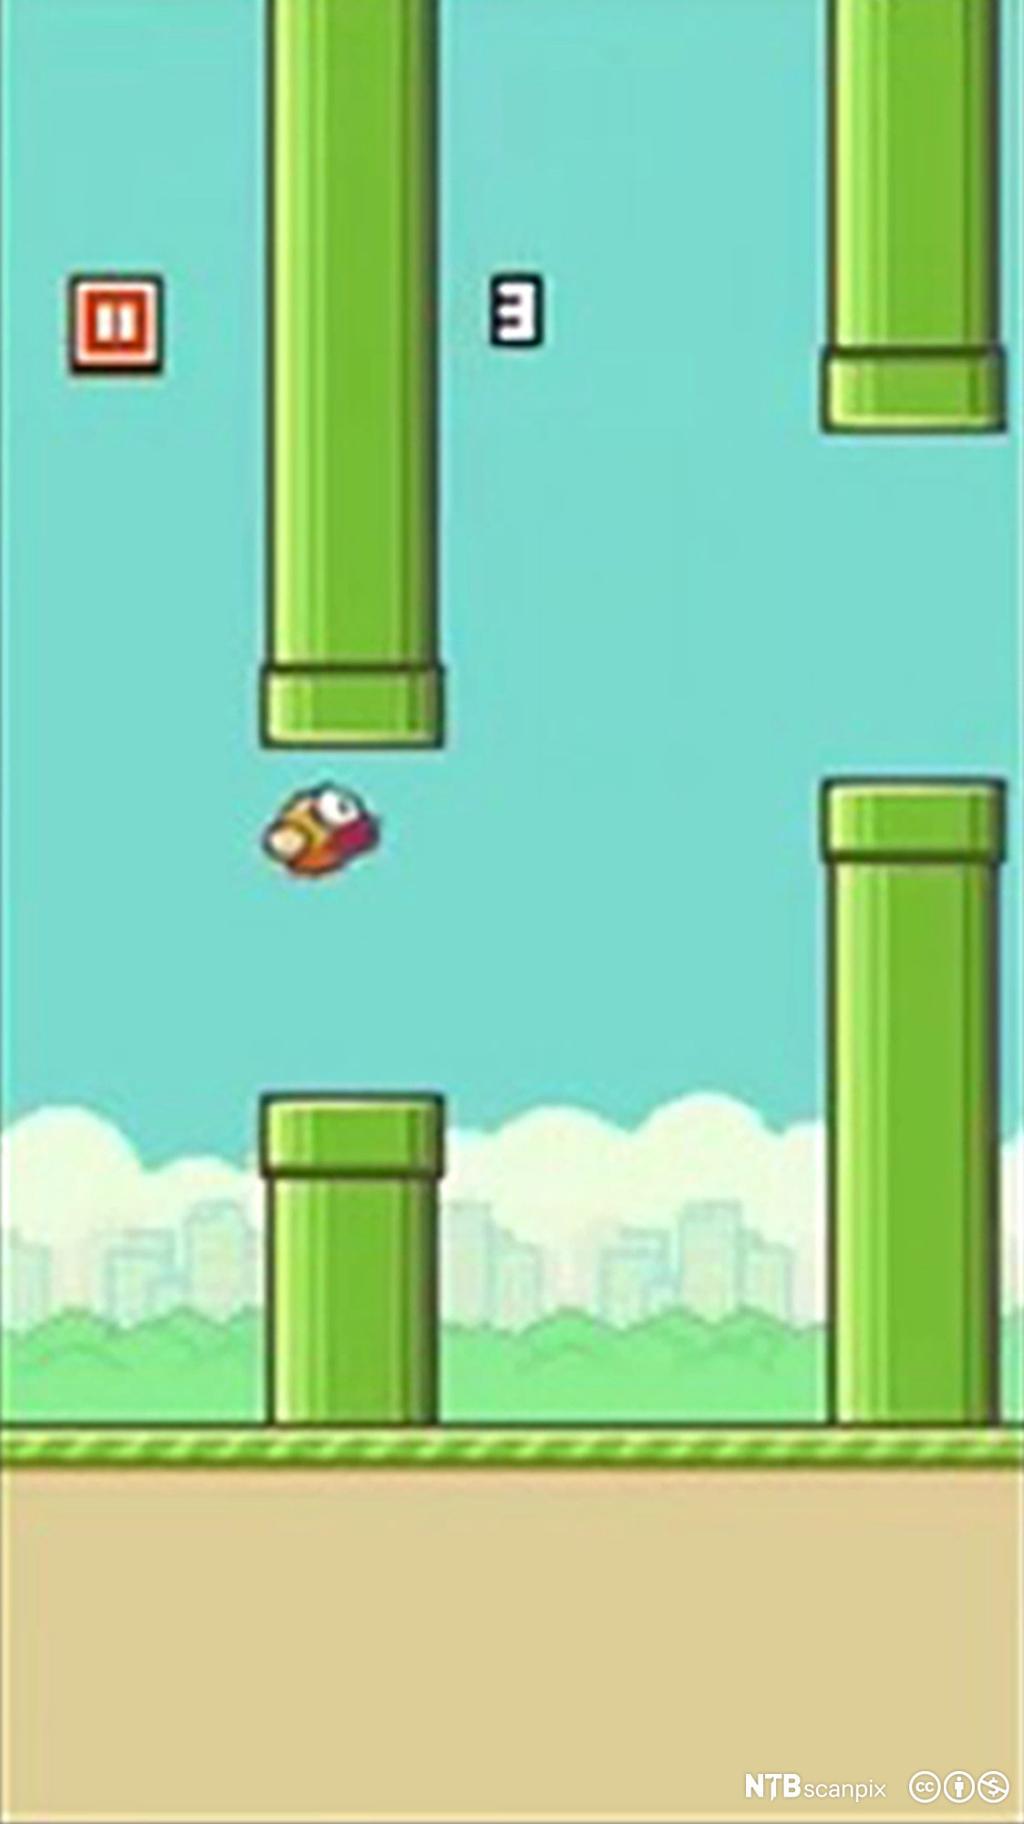 Minifugl flyr mellom stolper i et mobildataspill. Skjermdump.